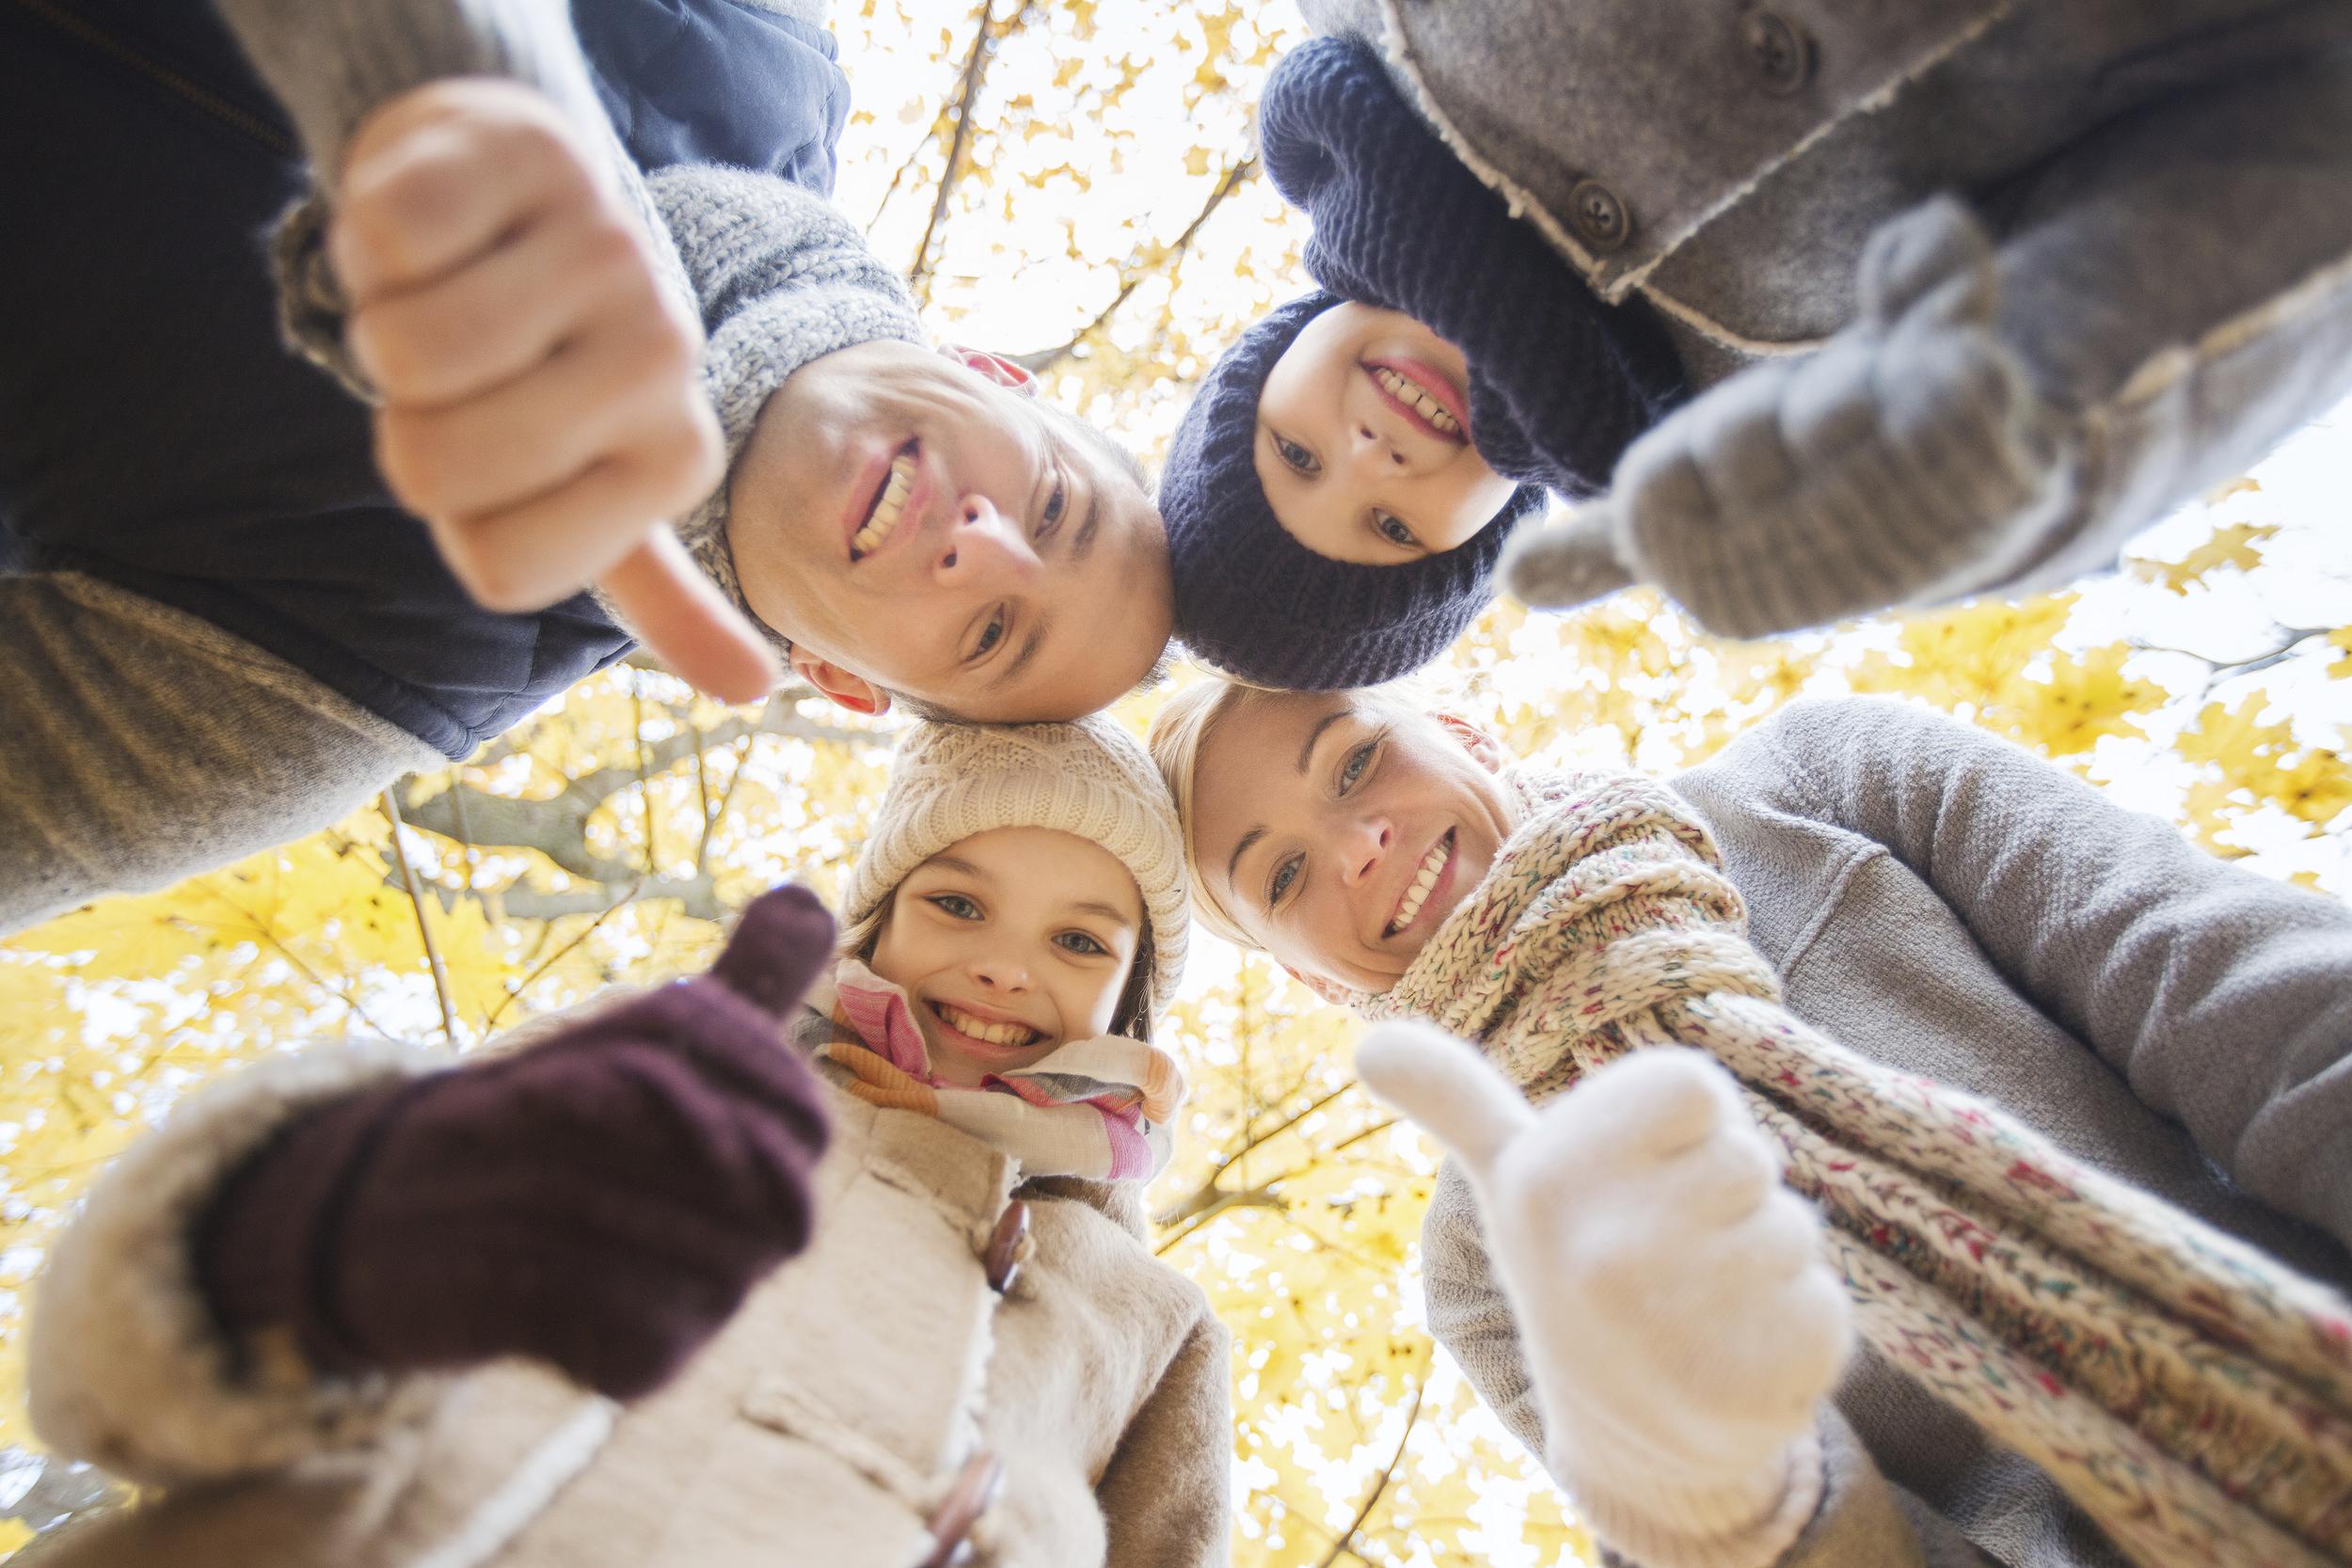 fondation_stock-photo-53457468-happy-family-in-autumn-park.jpg